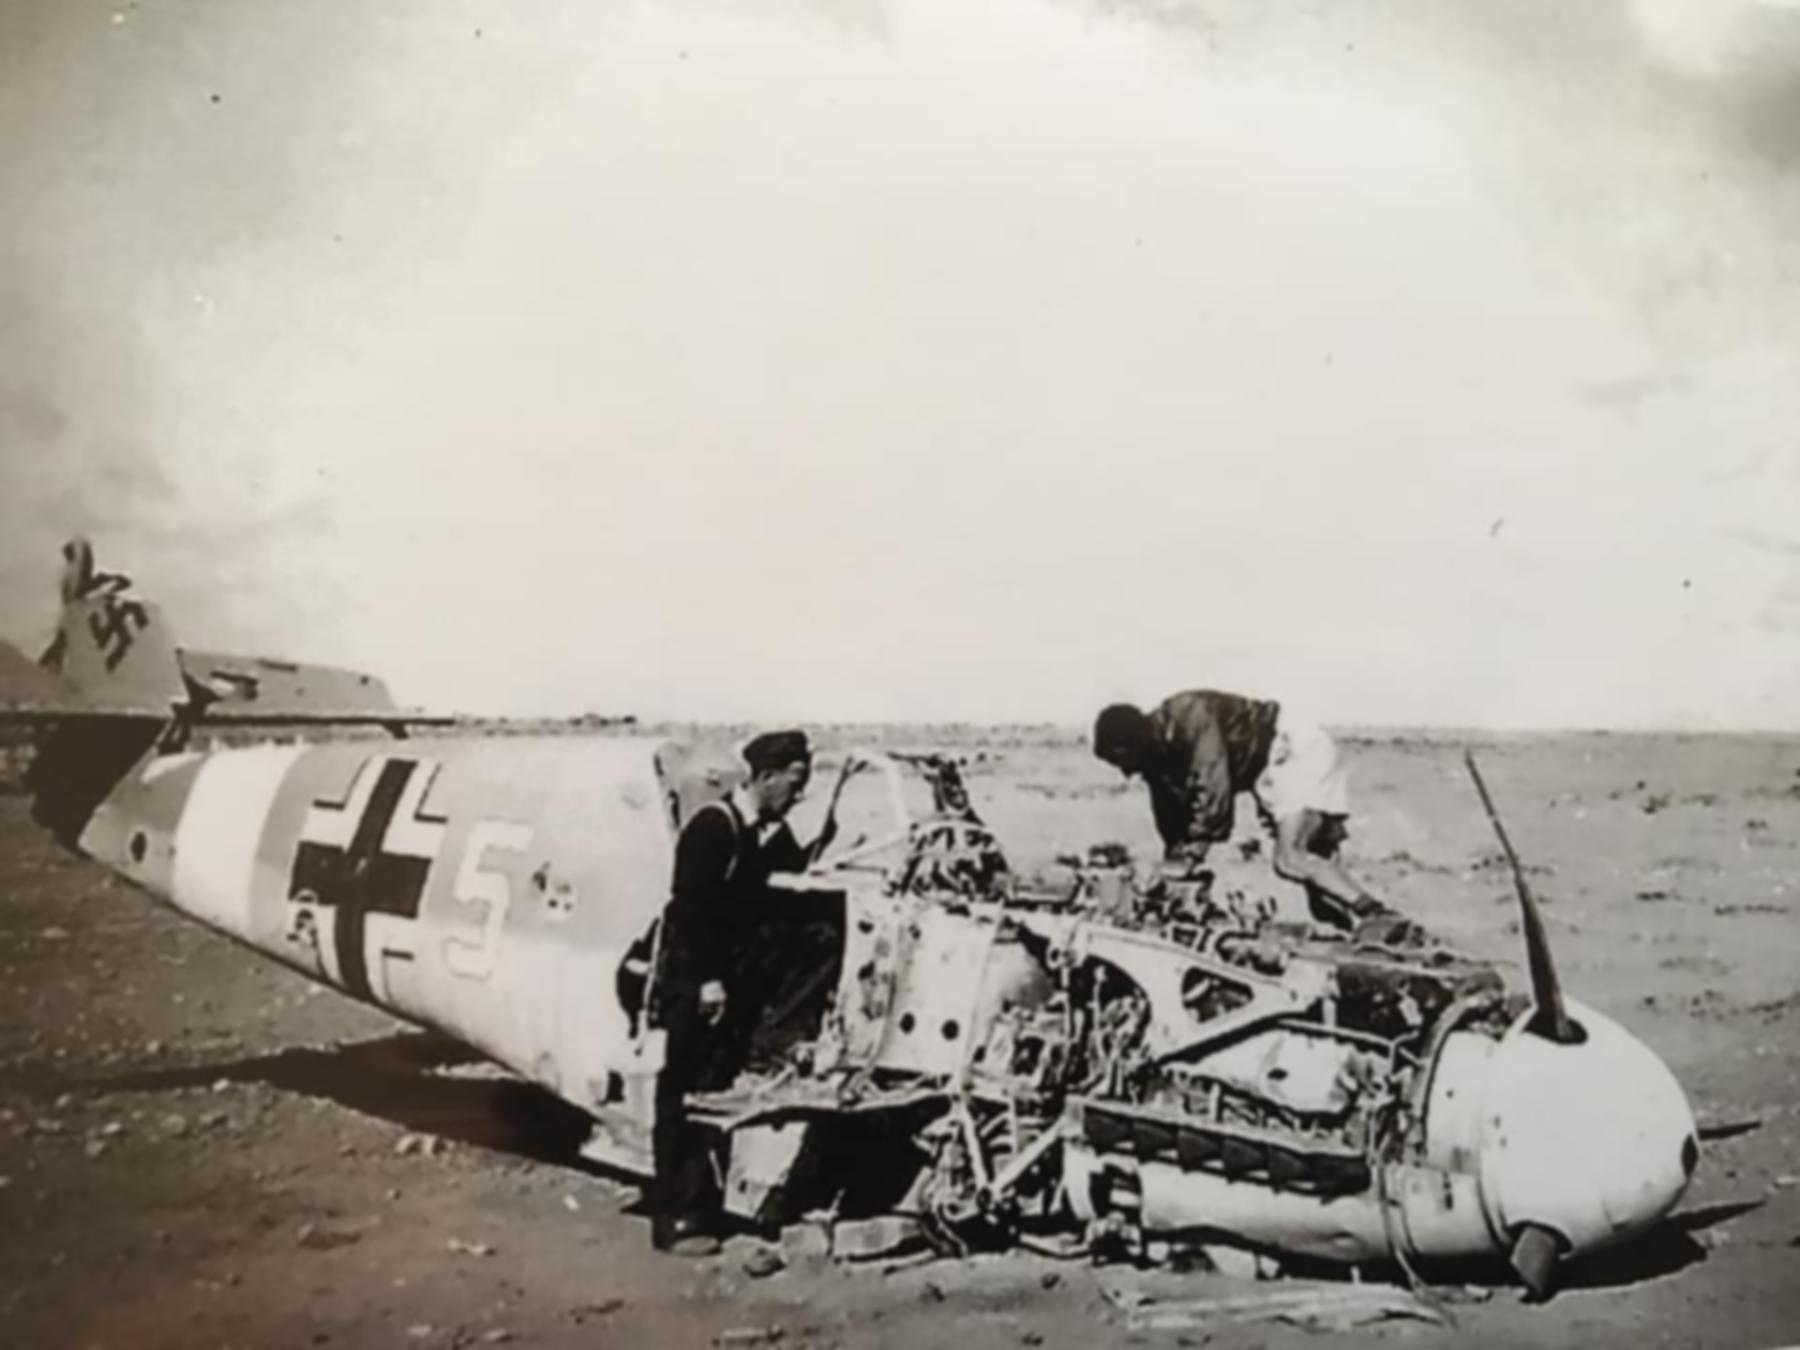 Messerschmitt Bf 109F4Trop 1.JG27 White 5 Albert Espenlaub crash landed El Adem Dec 1941 06